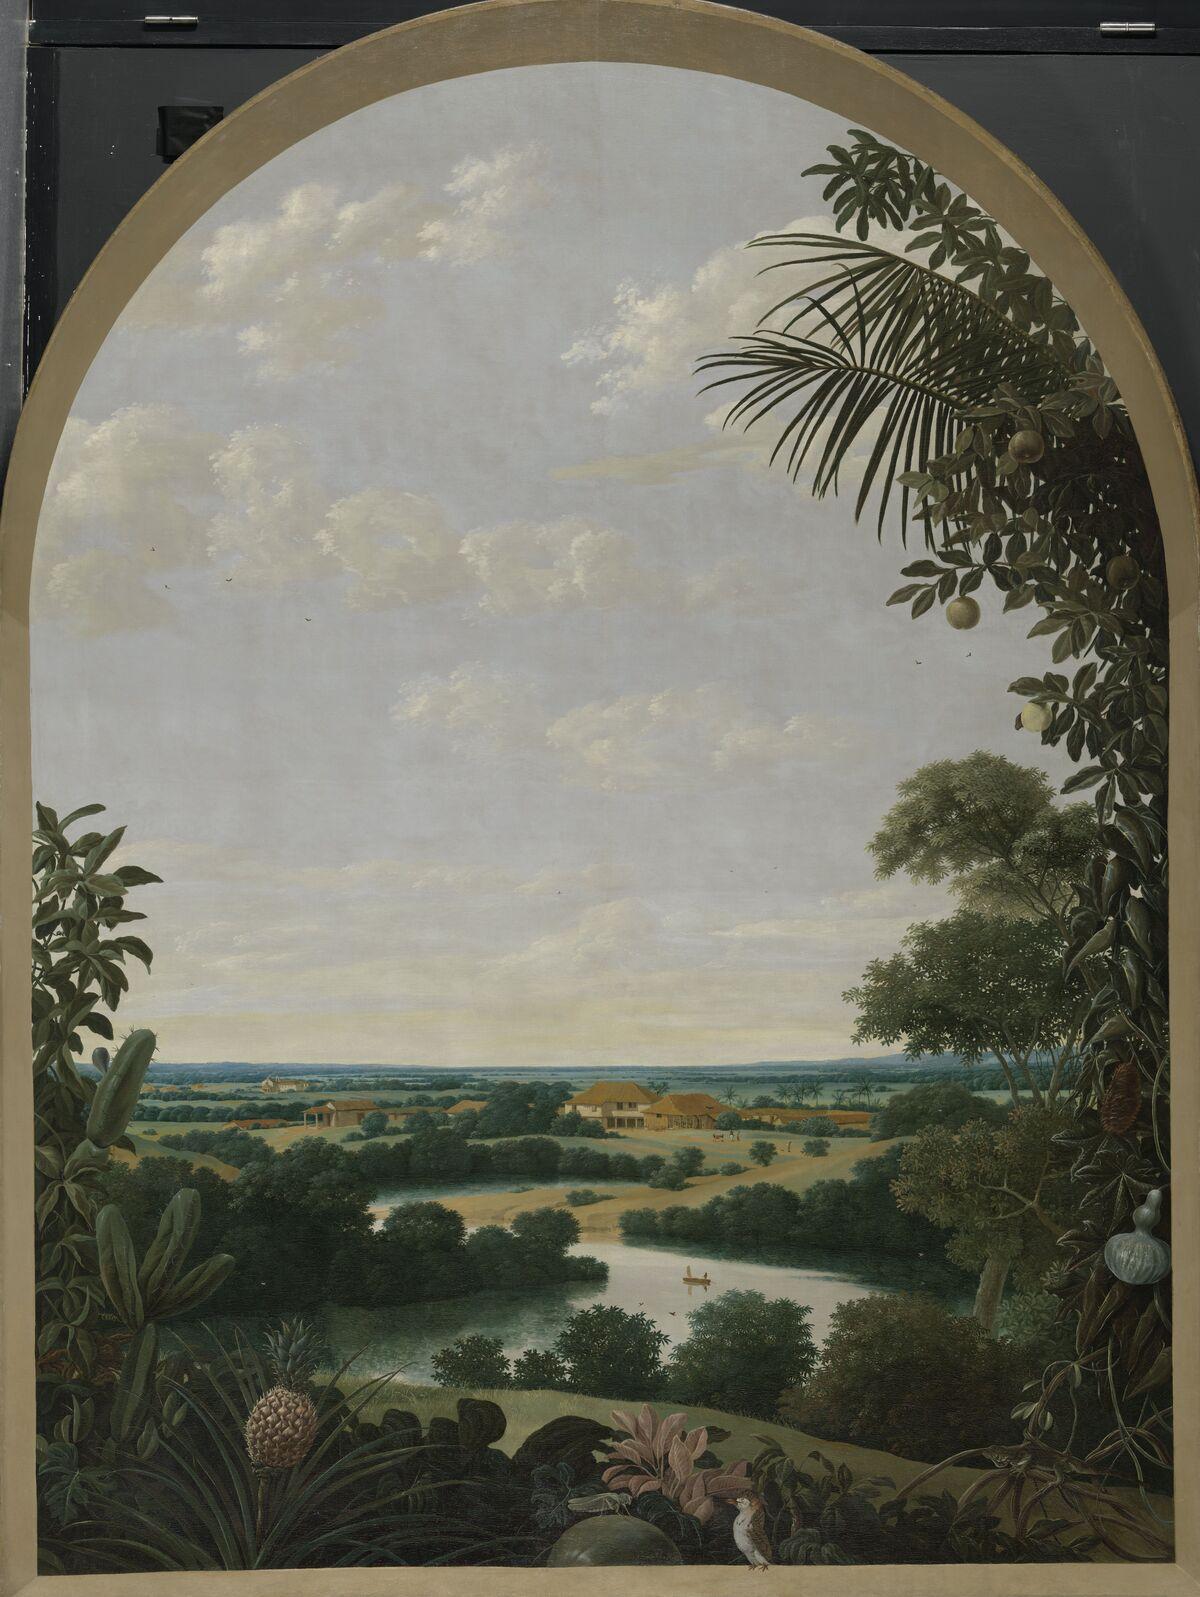 Frans Jansz Post, Landscape in Brazil. 1652. Courtesy of the Rijksmuseum.